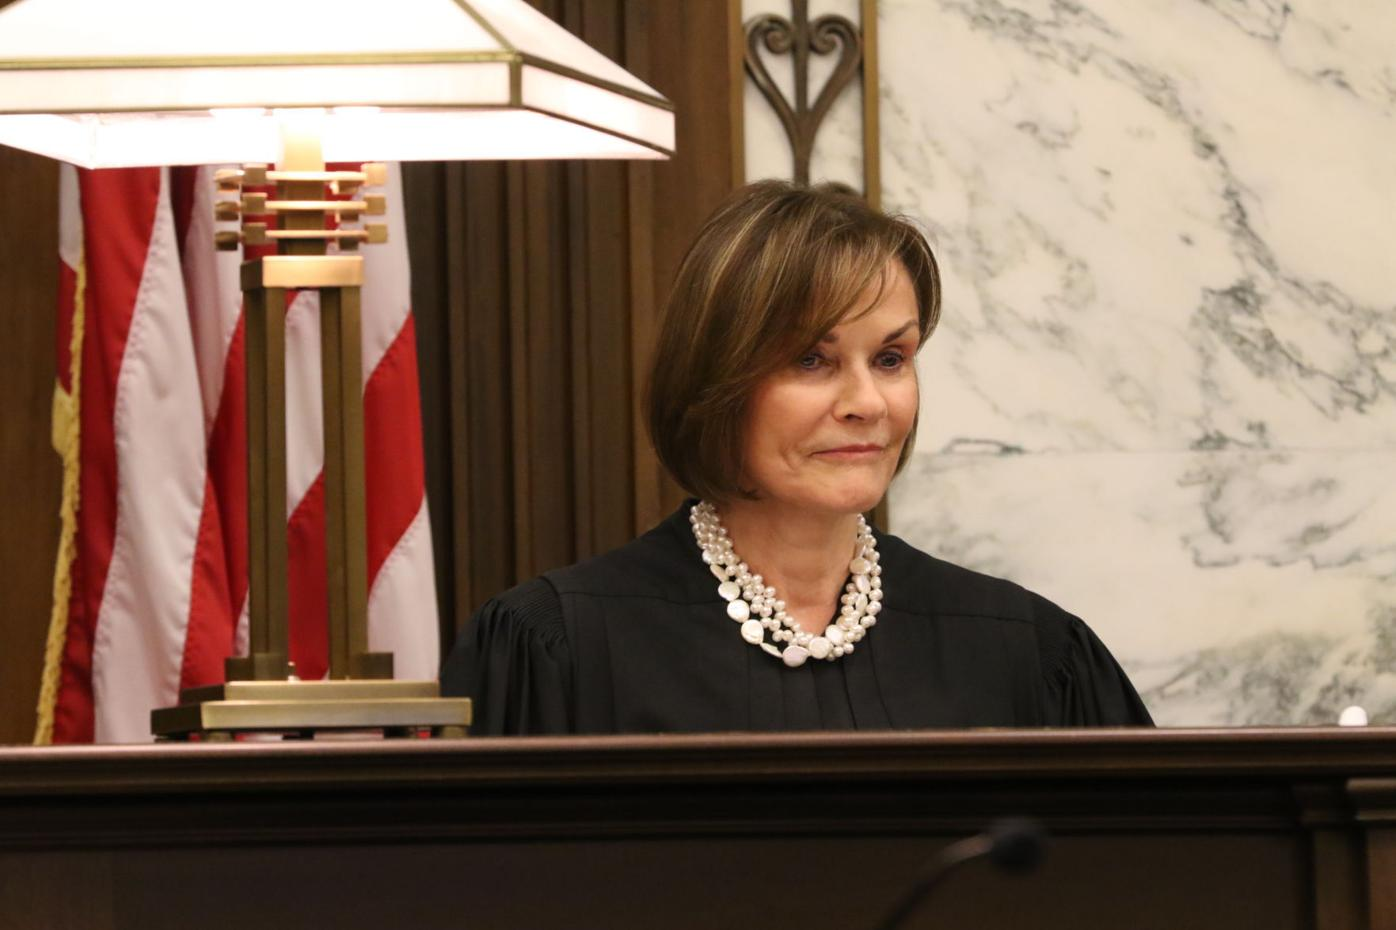 Judge Irene M. Keeley